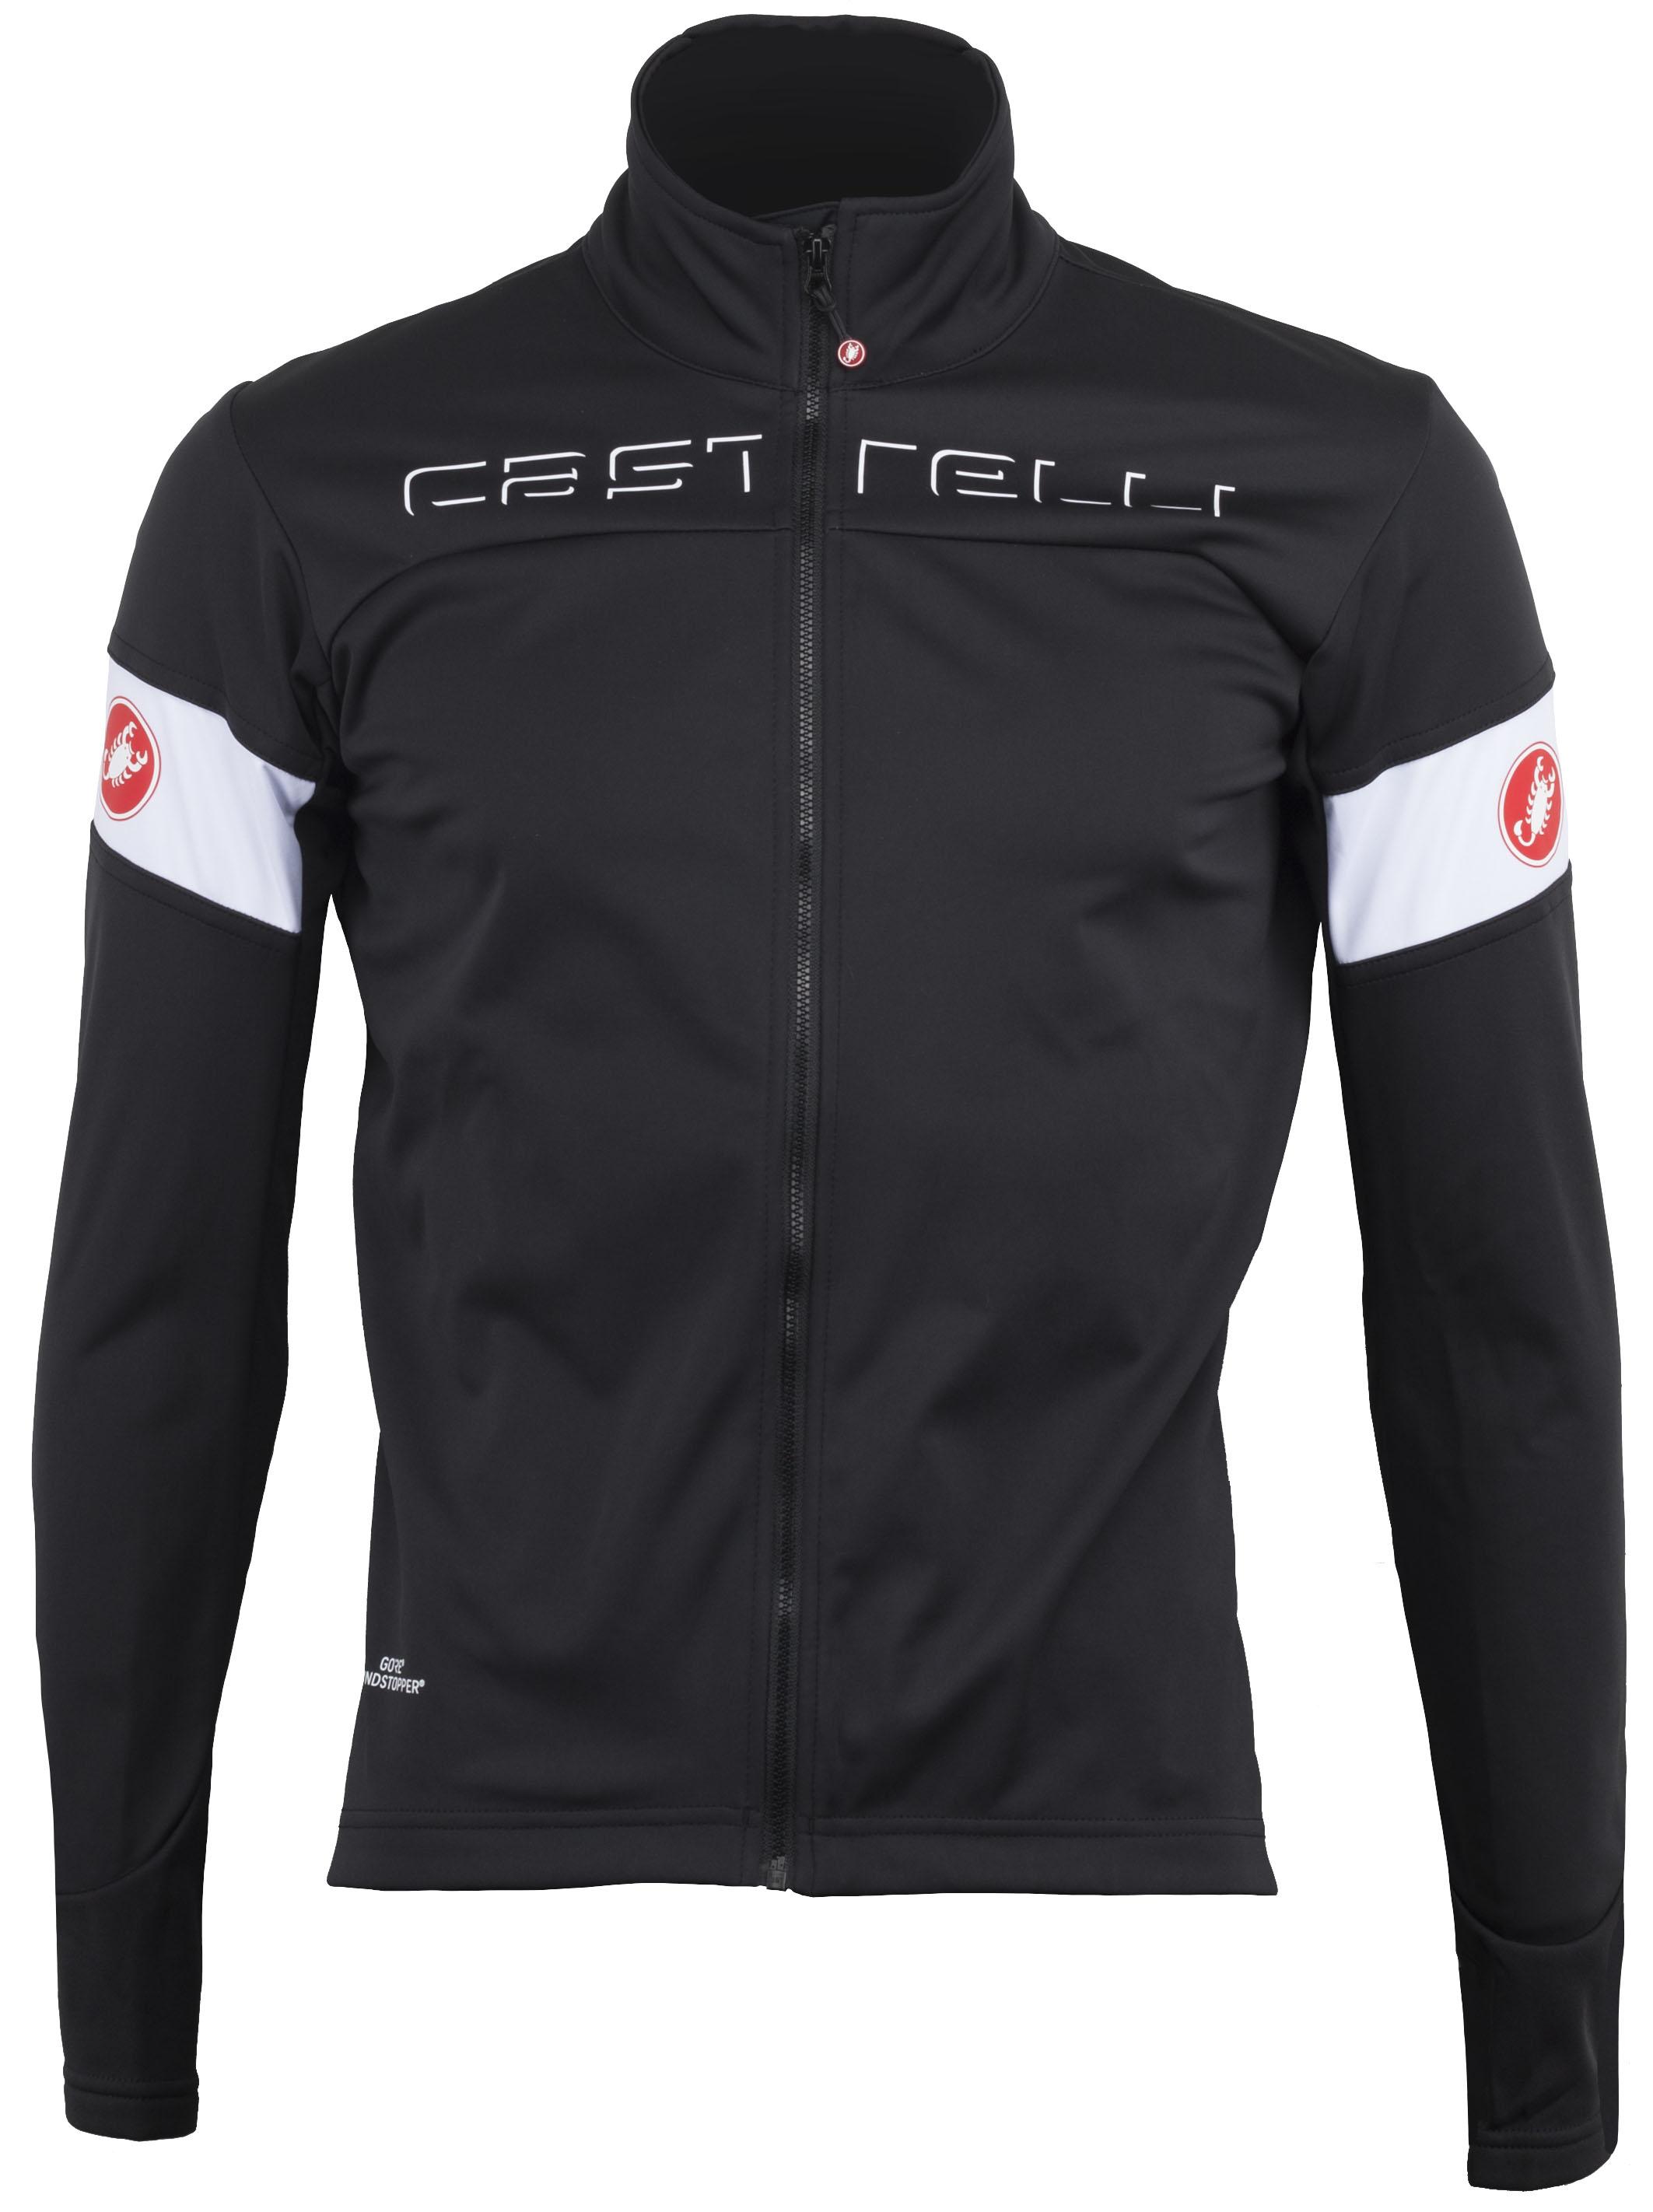 Castelli Transition Men's Cycling Jacket